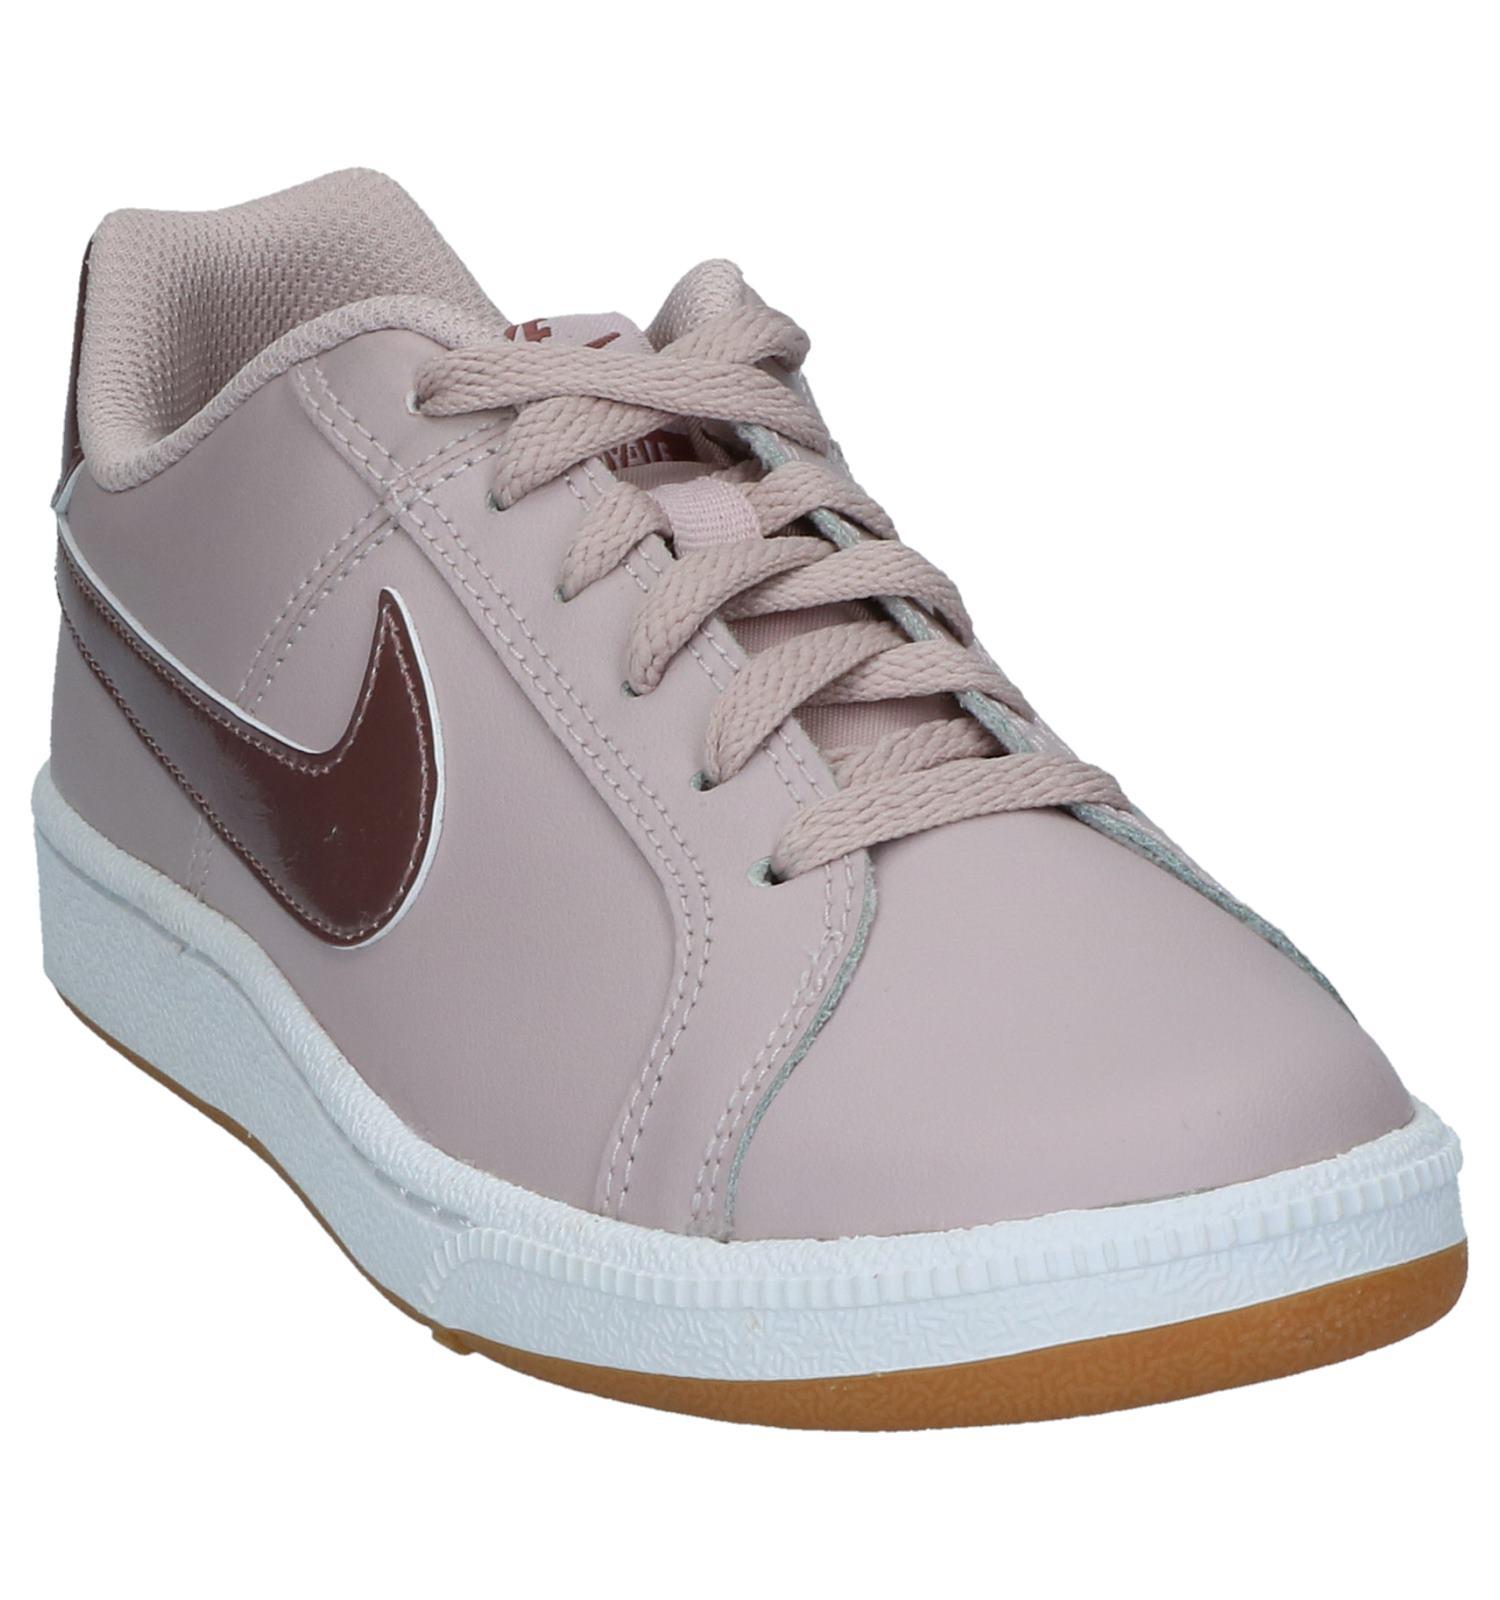 Roze Nike Court Royale Sneakers | TORFS.BE | Gratis verzend ...